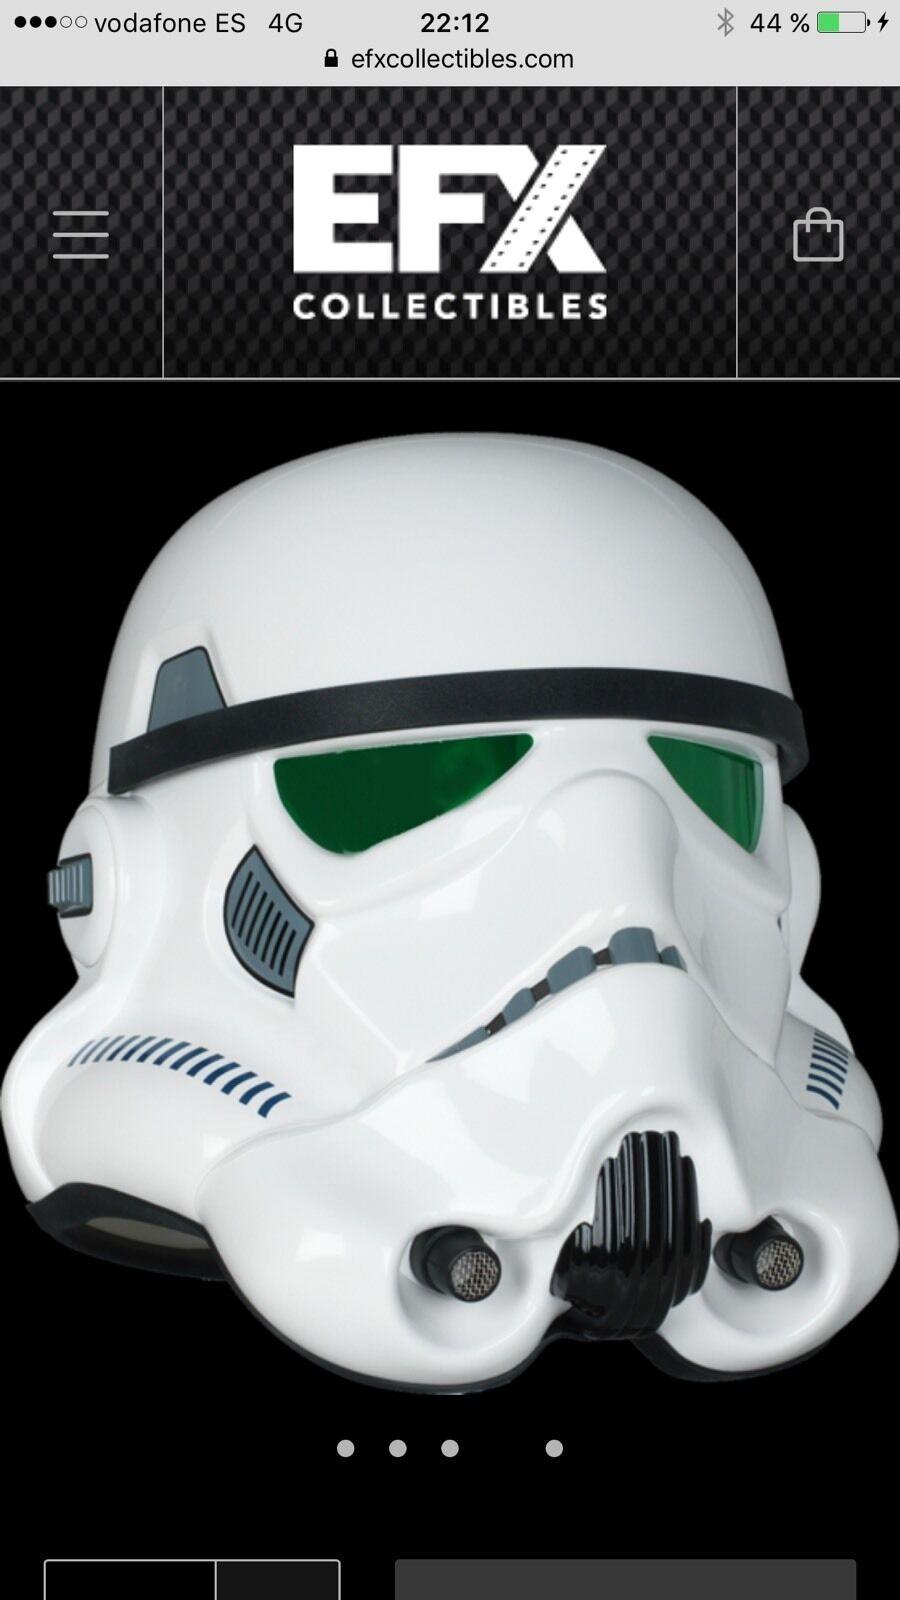 EFX STAR WARS A NEW HOPE STORMTROOPER HELMET 1/1 PRECISION CAST REPLICA